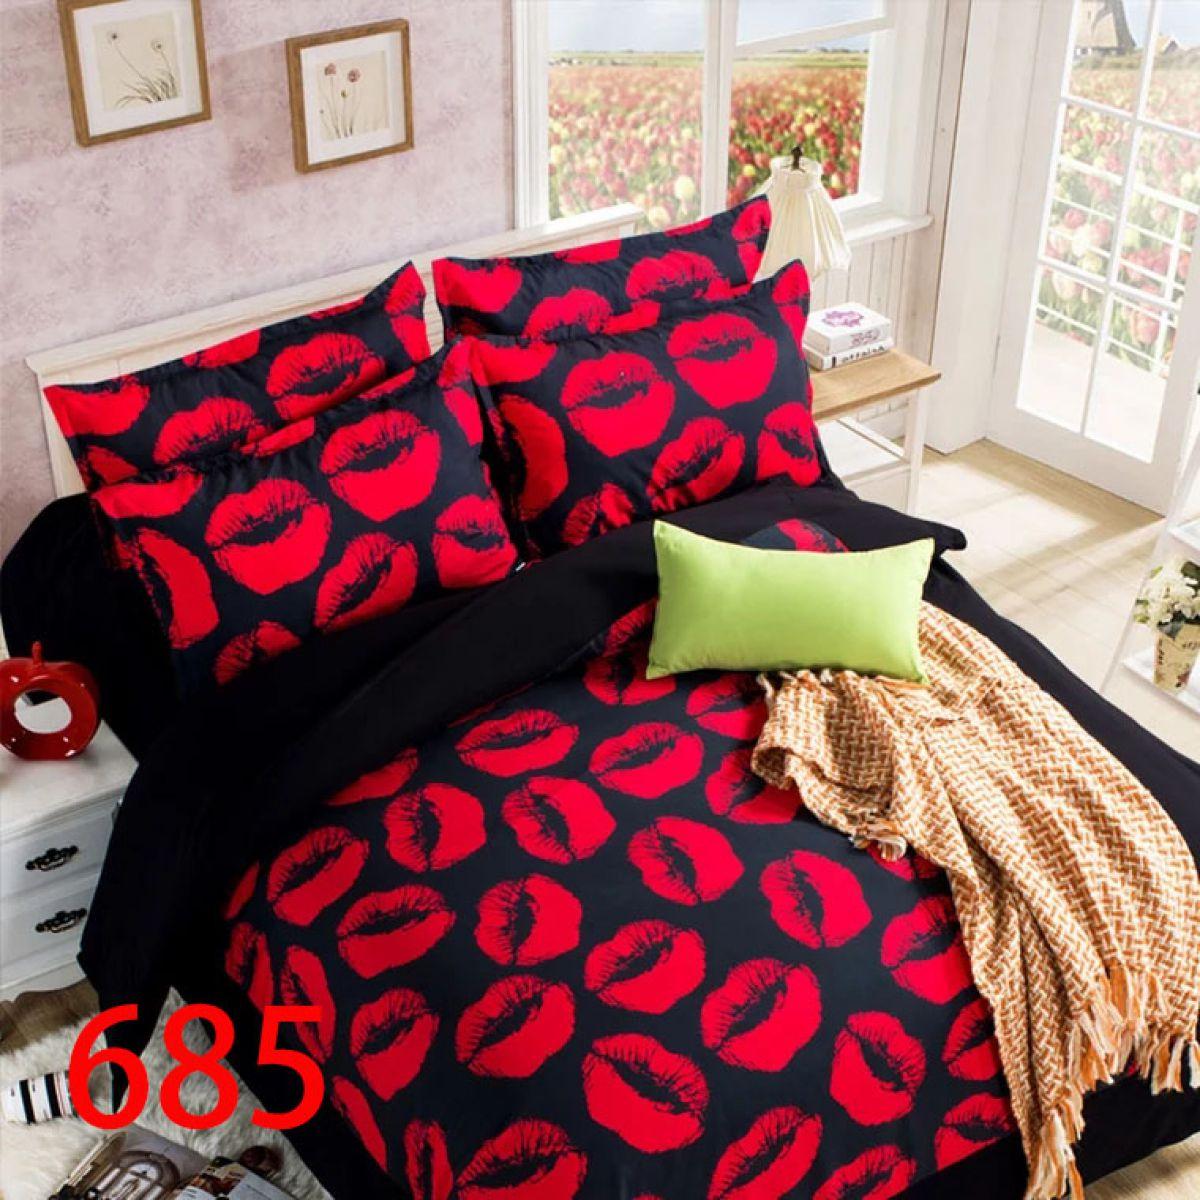 3D Beddings - Antonio - AML-4253 - 220x200 cm - 3 pcs